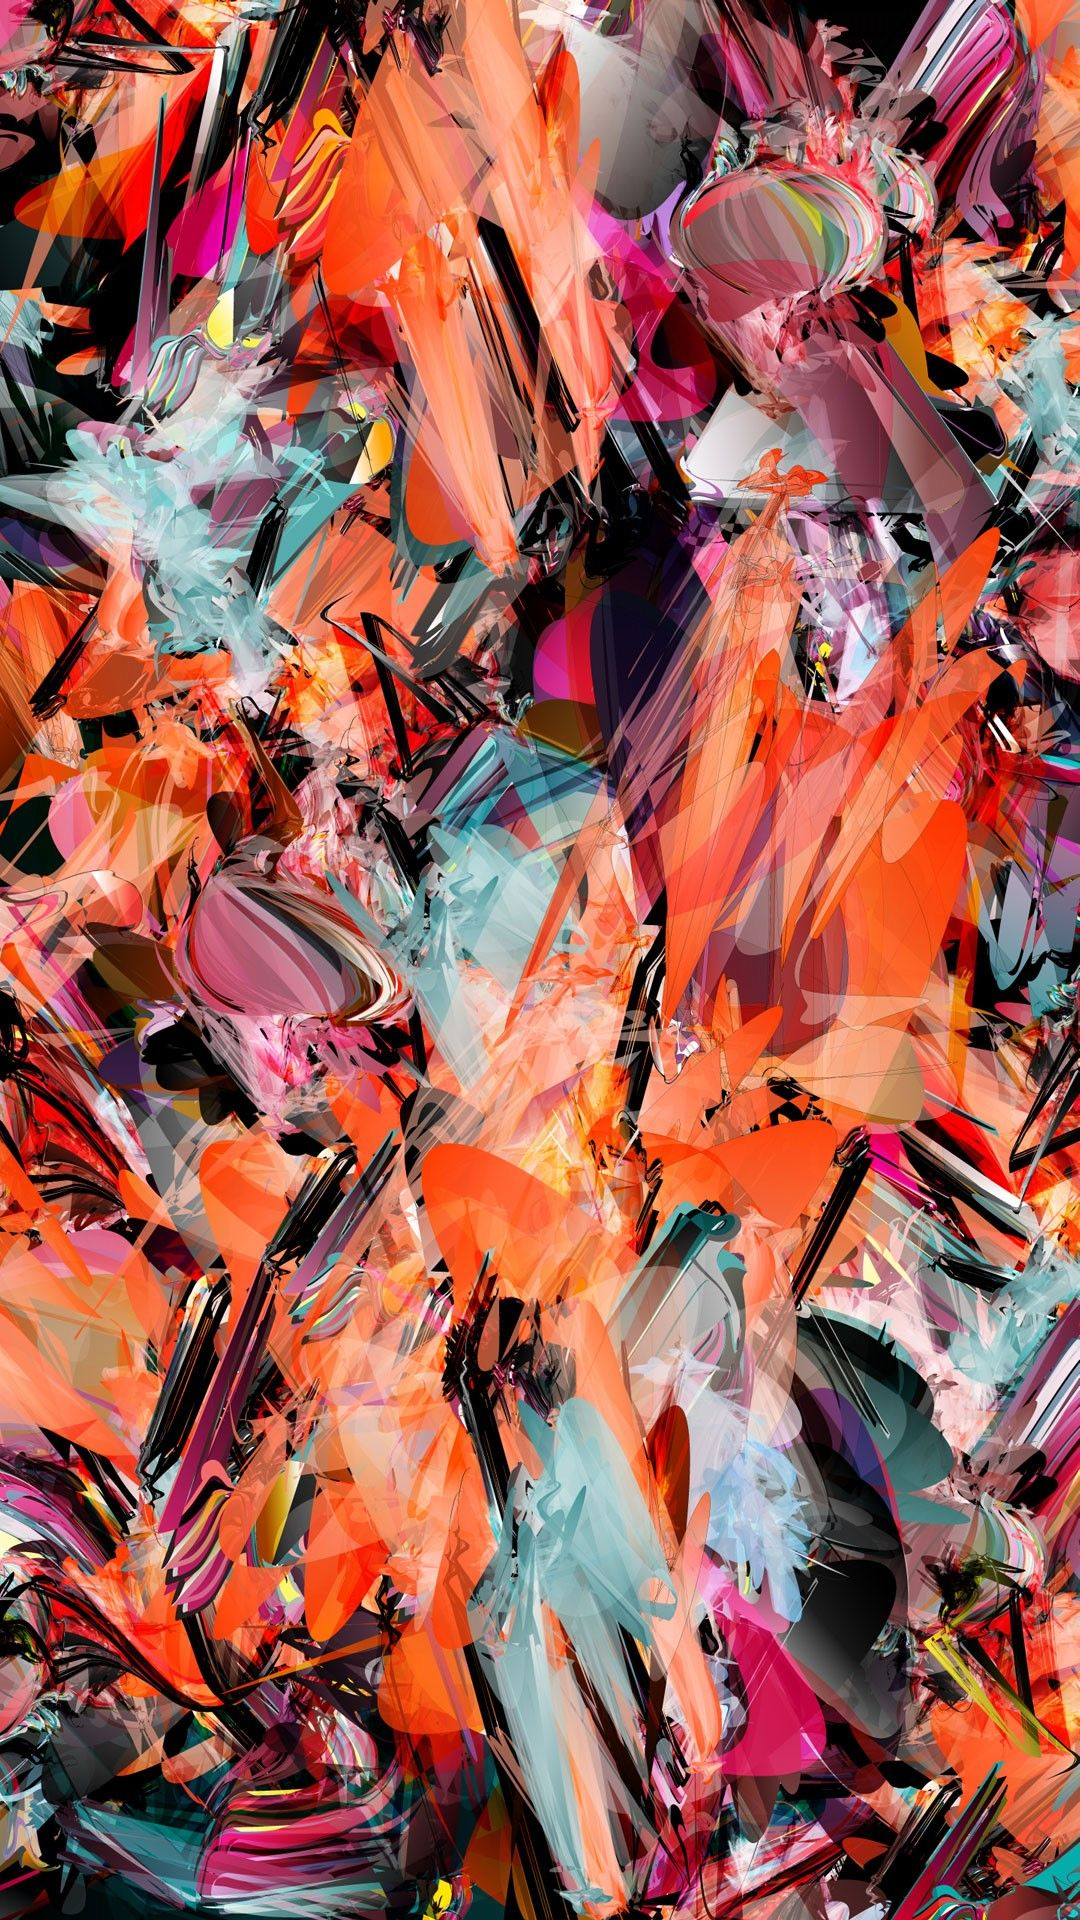 W_White   Абстрактное, Абстрактные картины, Абстрактные ...